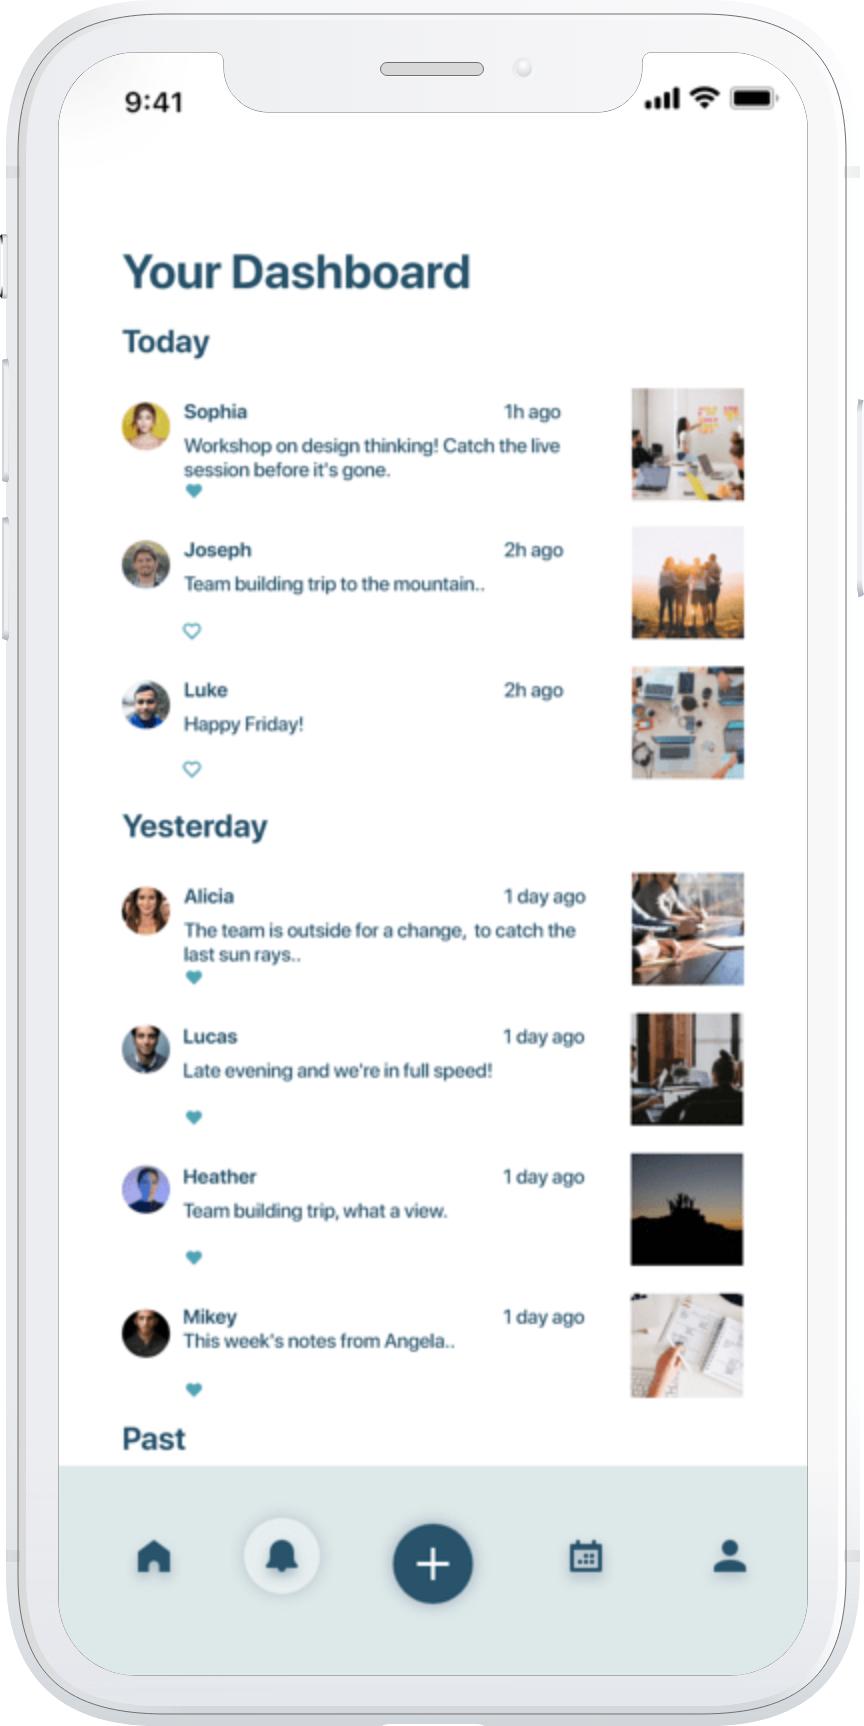 ContentCollect-Social-Media-App-Mockups-03